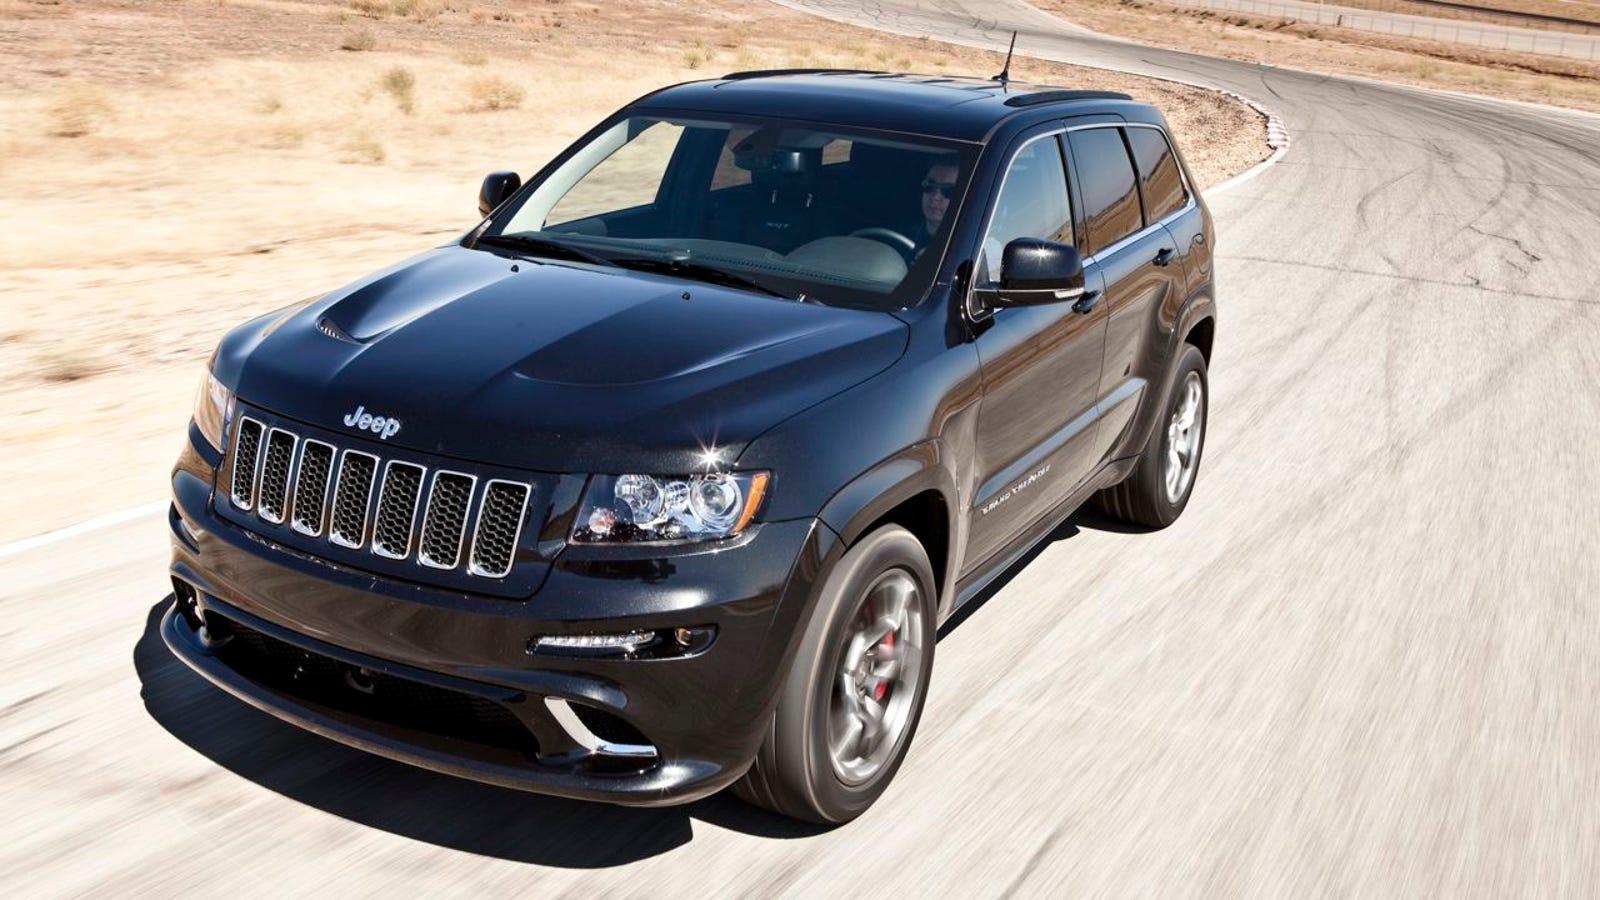 2012 Jeep Grand Cherokee SRT8: First Drive